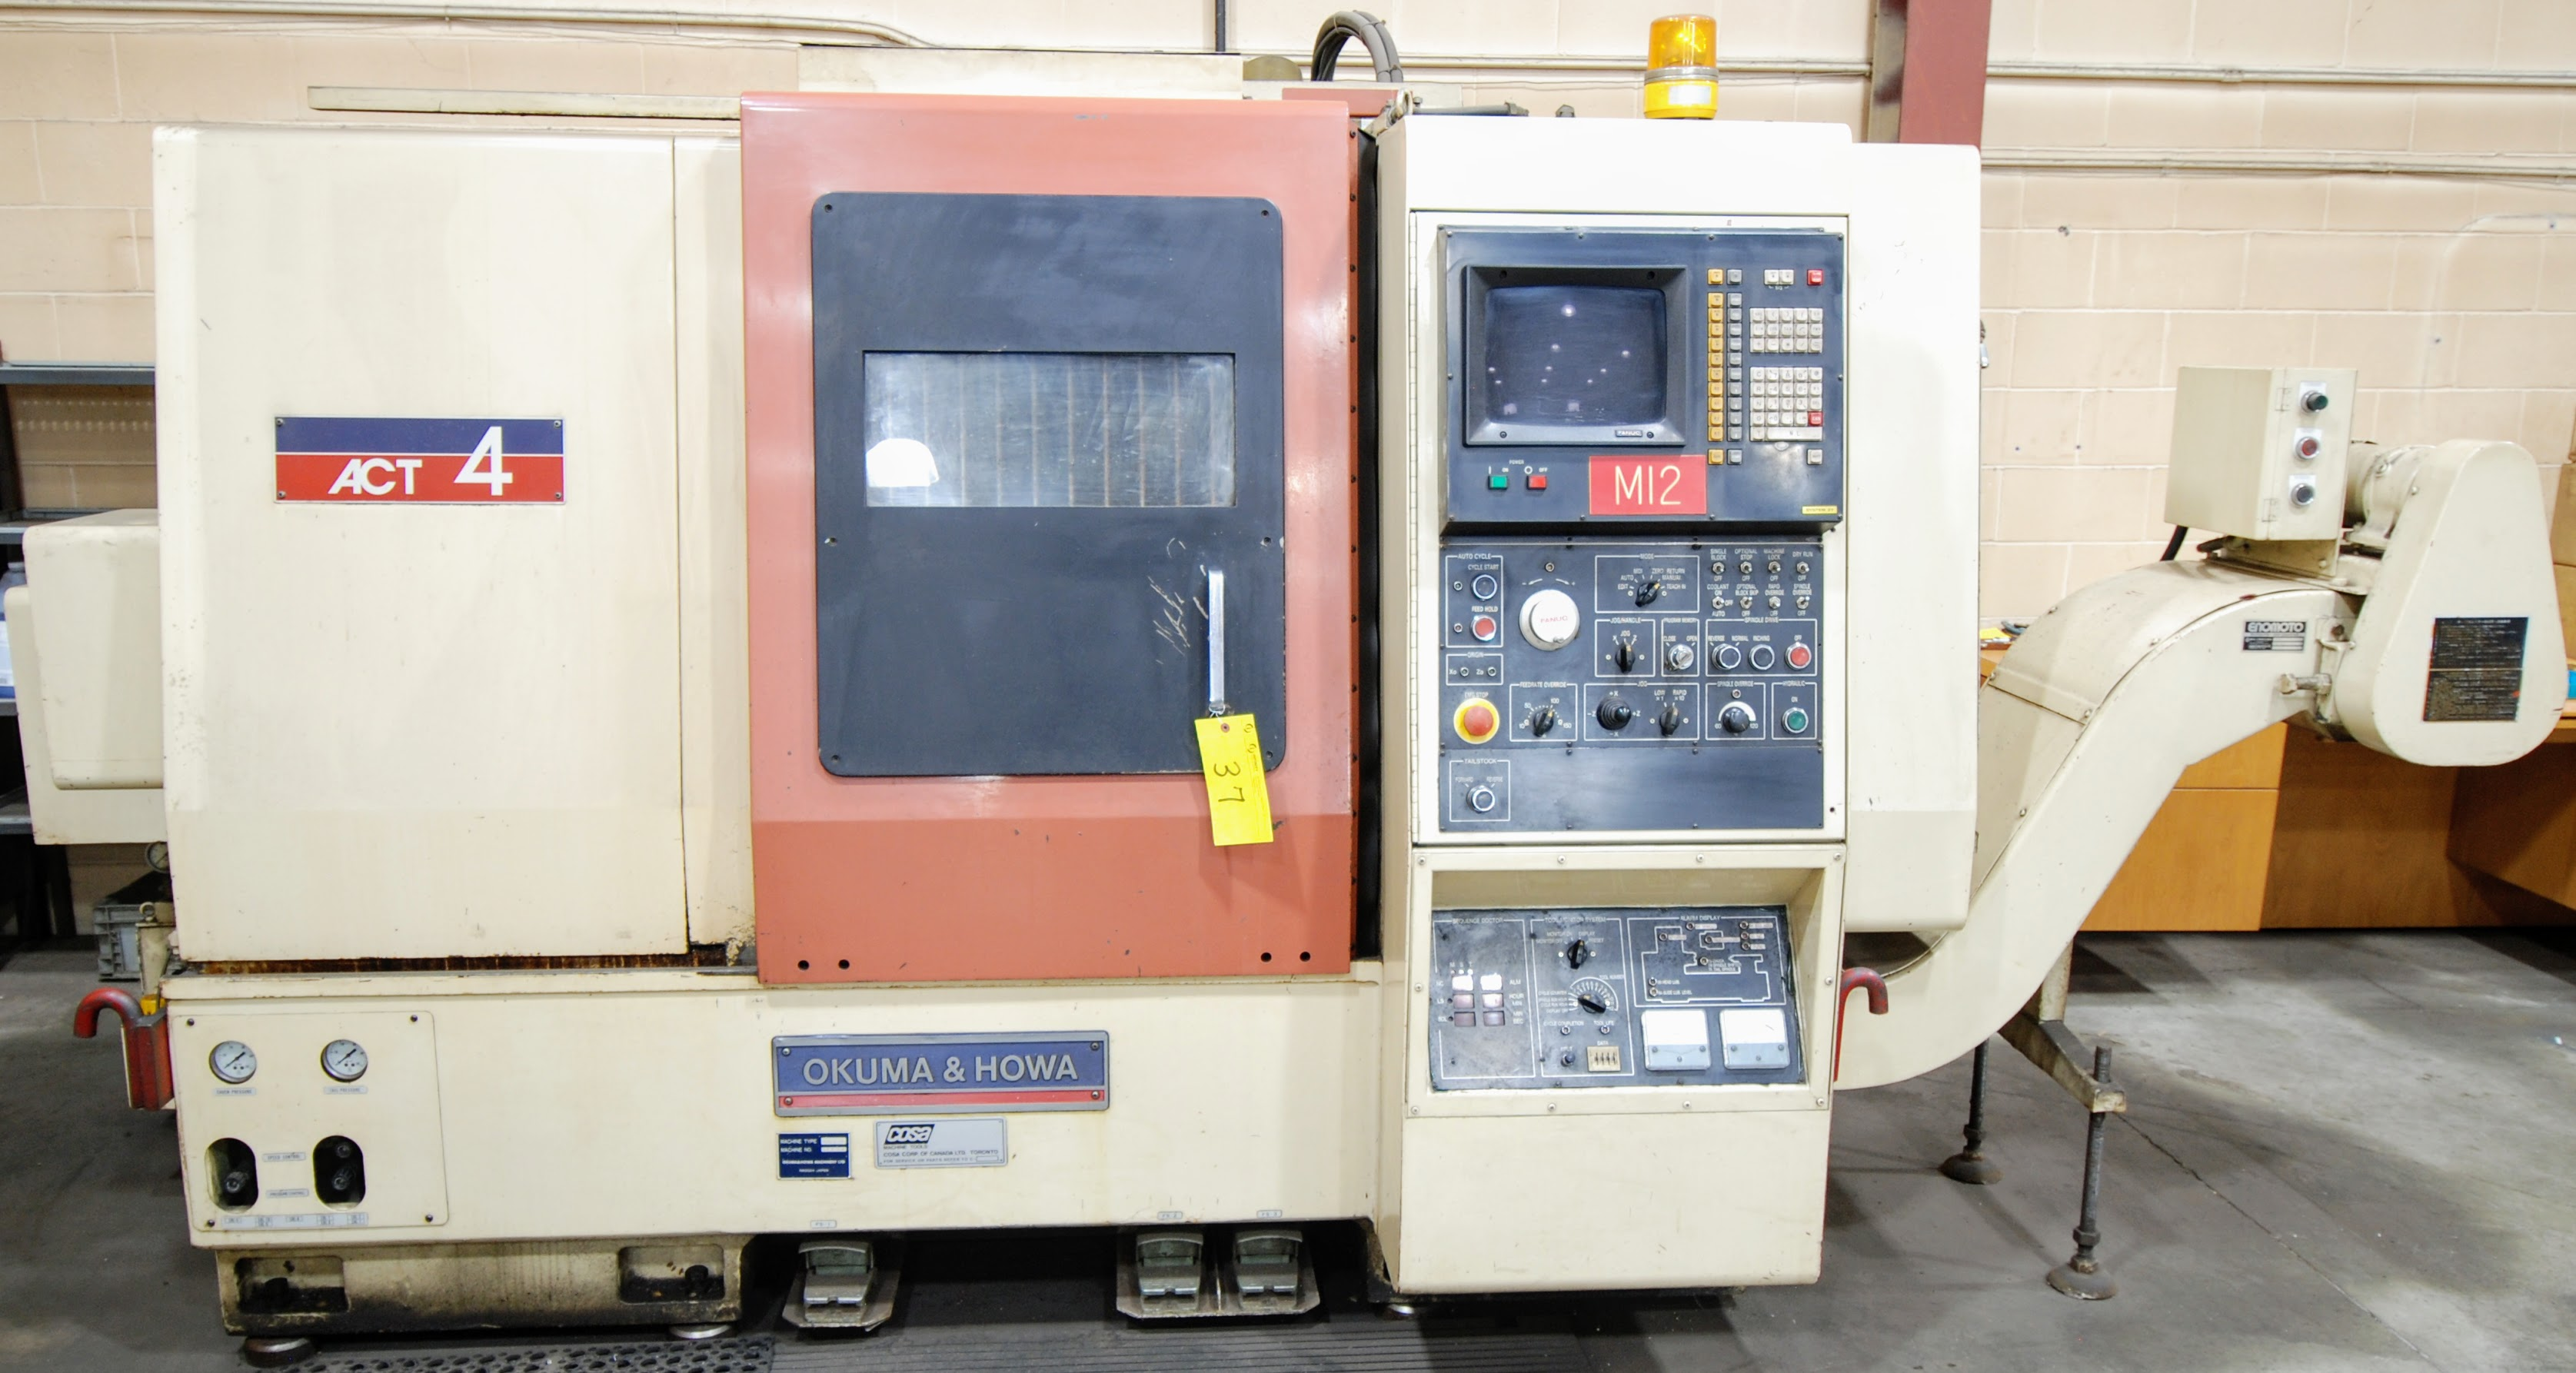 "OKUMA ACT-4 CNC LATHE W/12"" 3 JAW CHUCK, FANUC CONTROL, TAIL STOCK, ATC-12 W/10 TOOL HOLDERS, - Image 2 of 17"